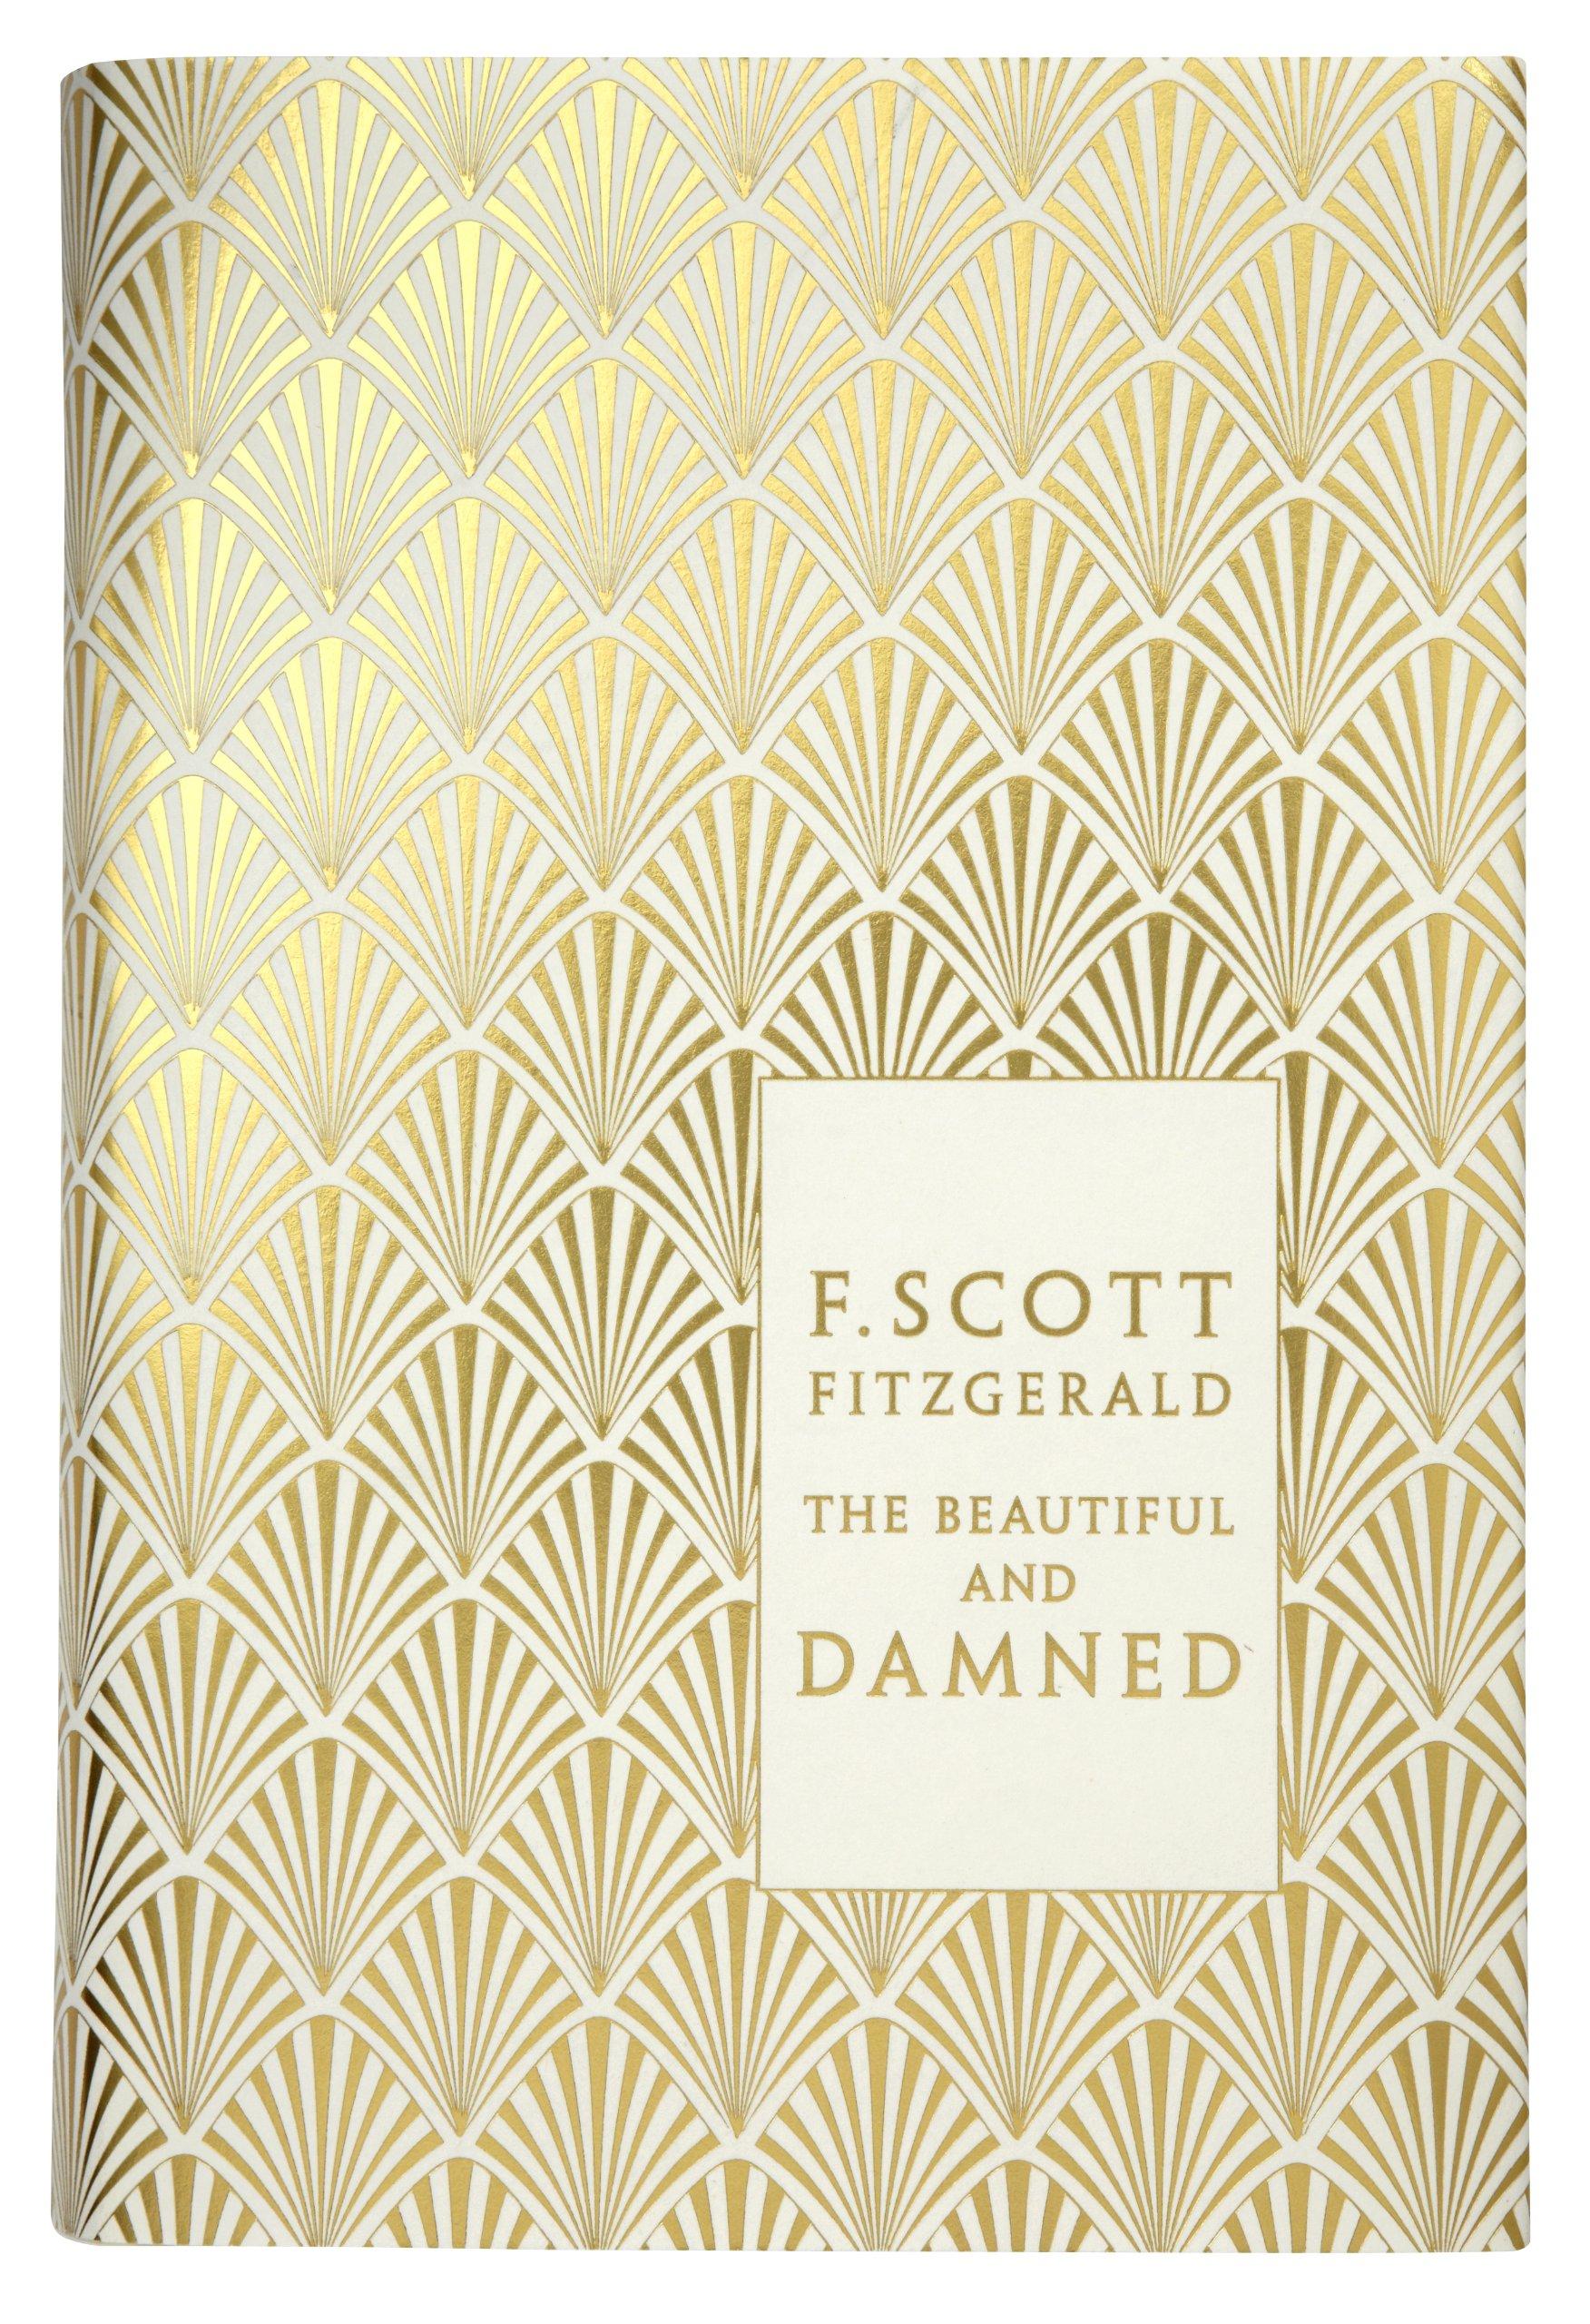 The Beautiful And Damned (a Penguin Classics Hardcover): F Scott Fitzgerald,  Coralie Bickfordsmith, Kermit Vanderbilt: 9780141194073: Amazon: Books